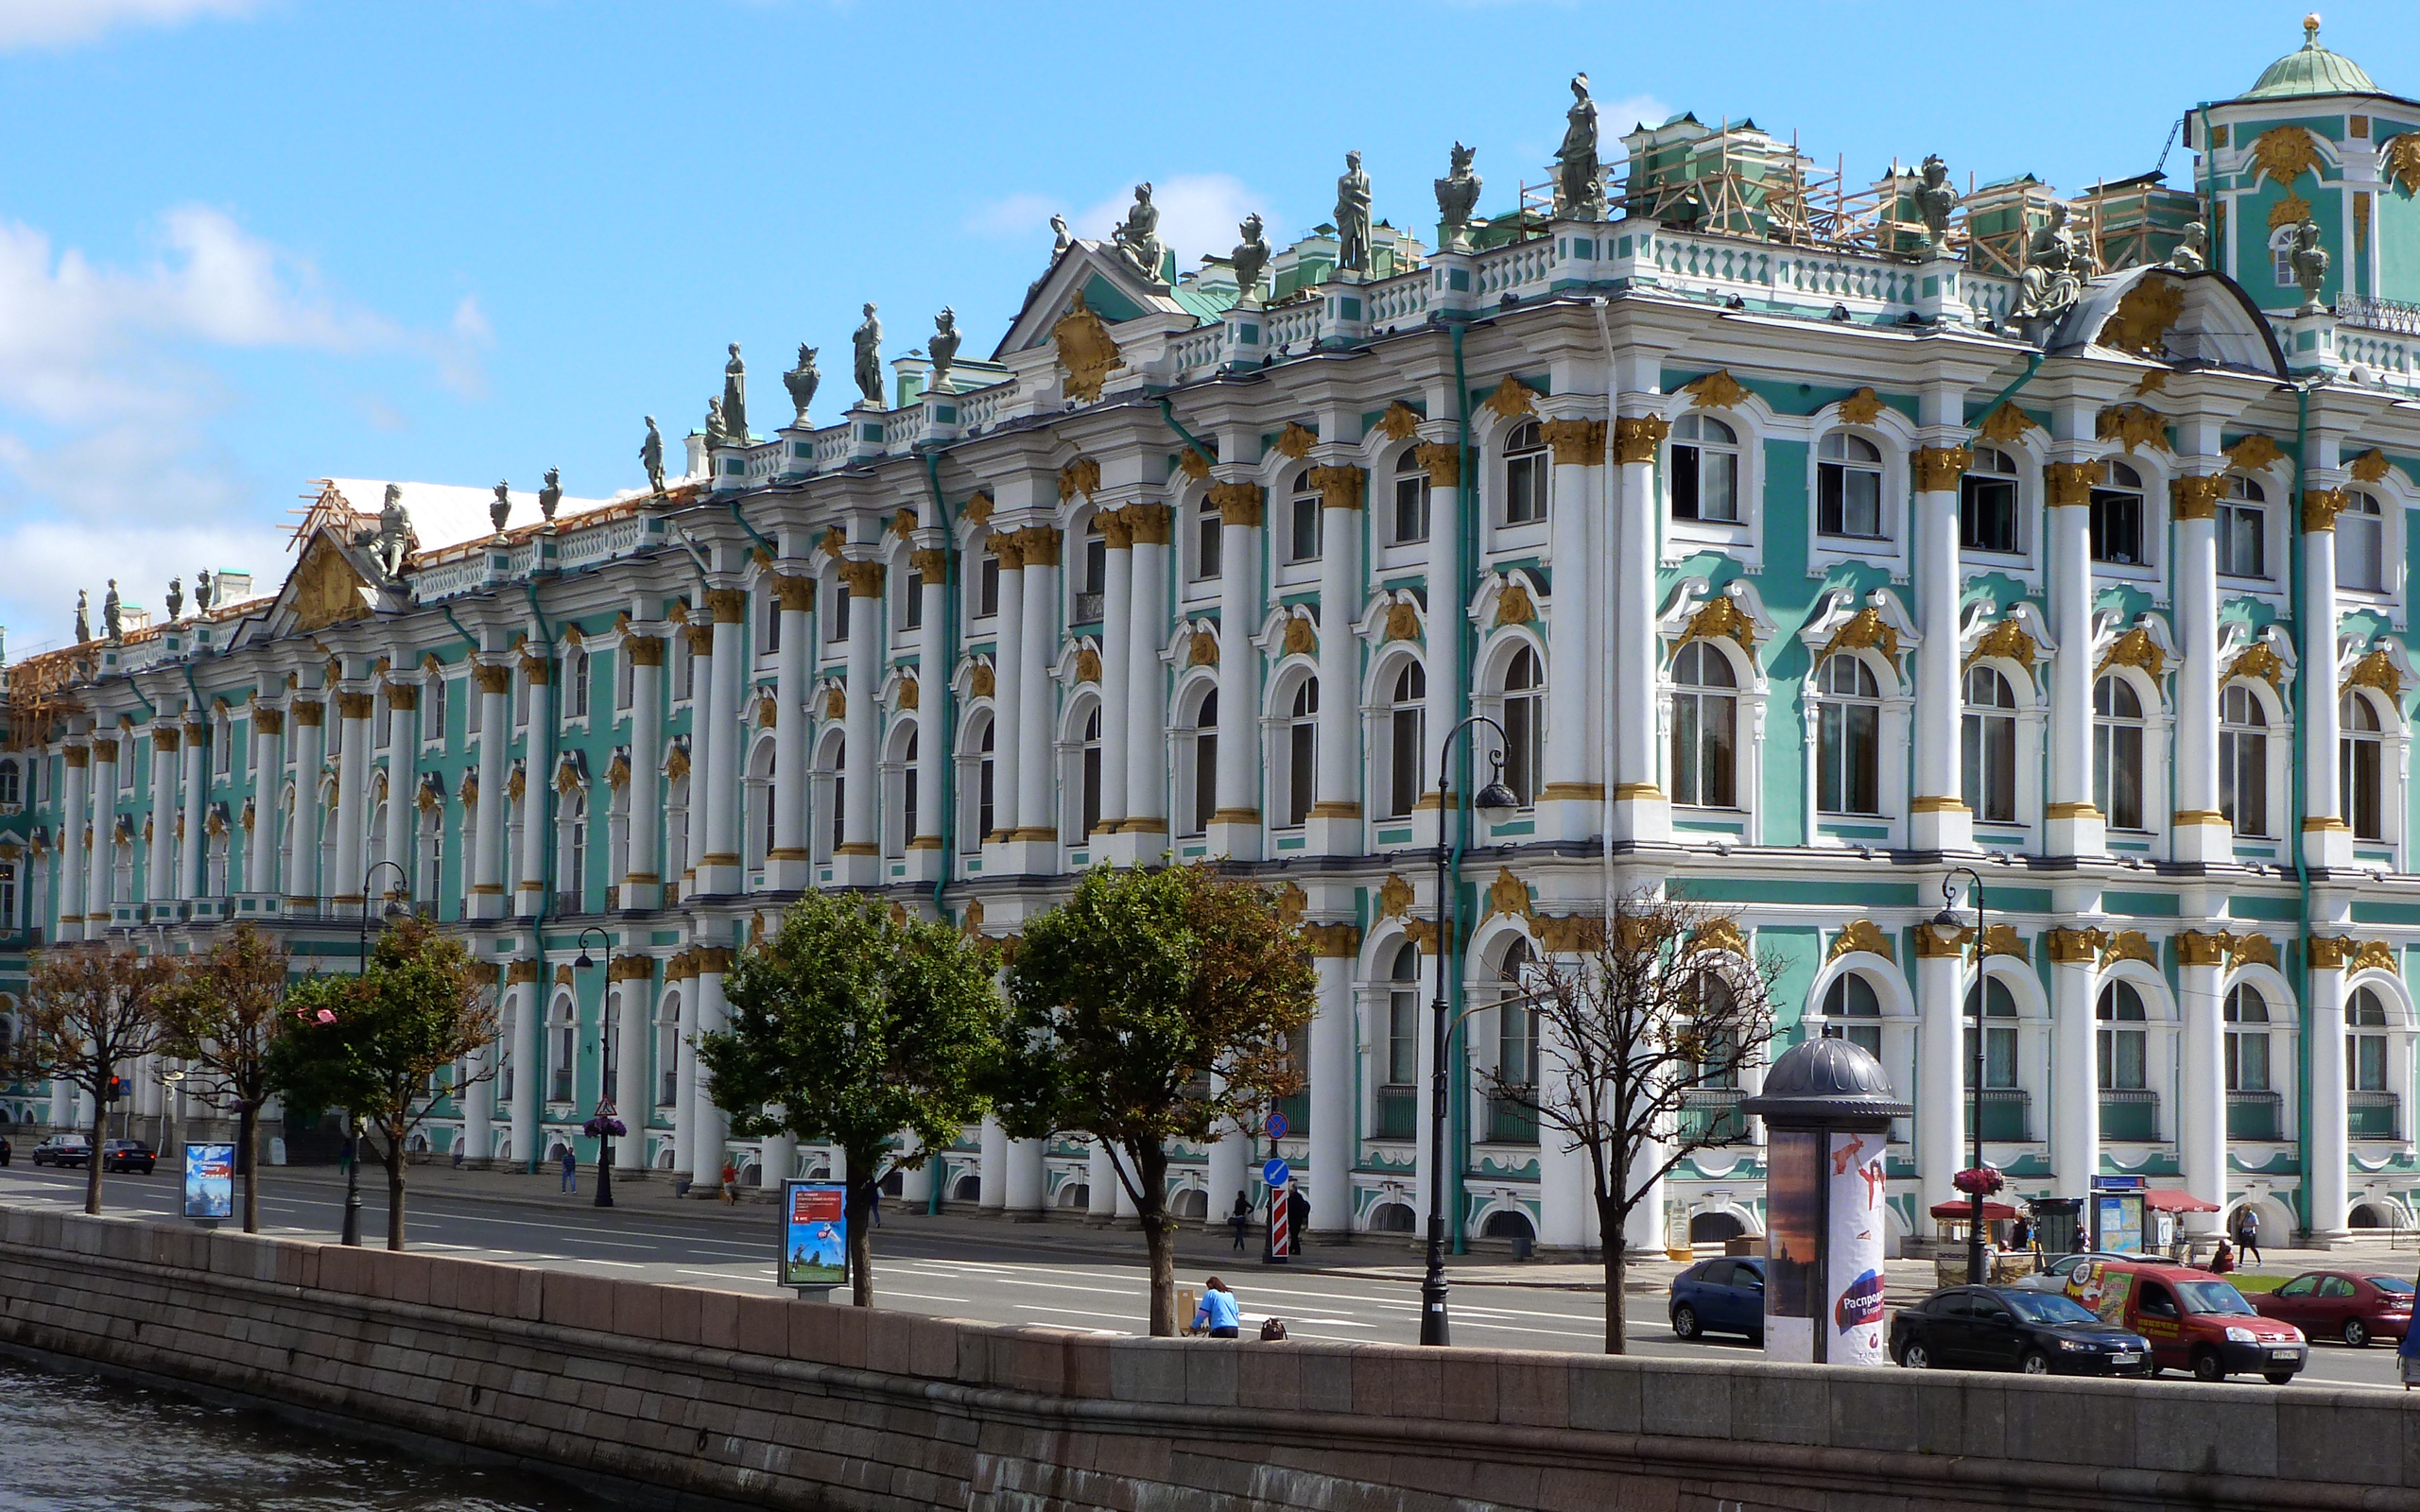 Эрмитаж в Санкт-Петербурге обои для ...: www.rabstol.net/oboi/russia/9455-ermitazh-v-sankt-peterburge.html